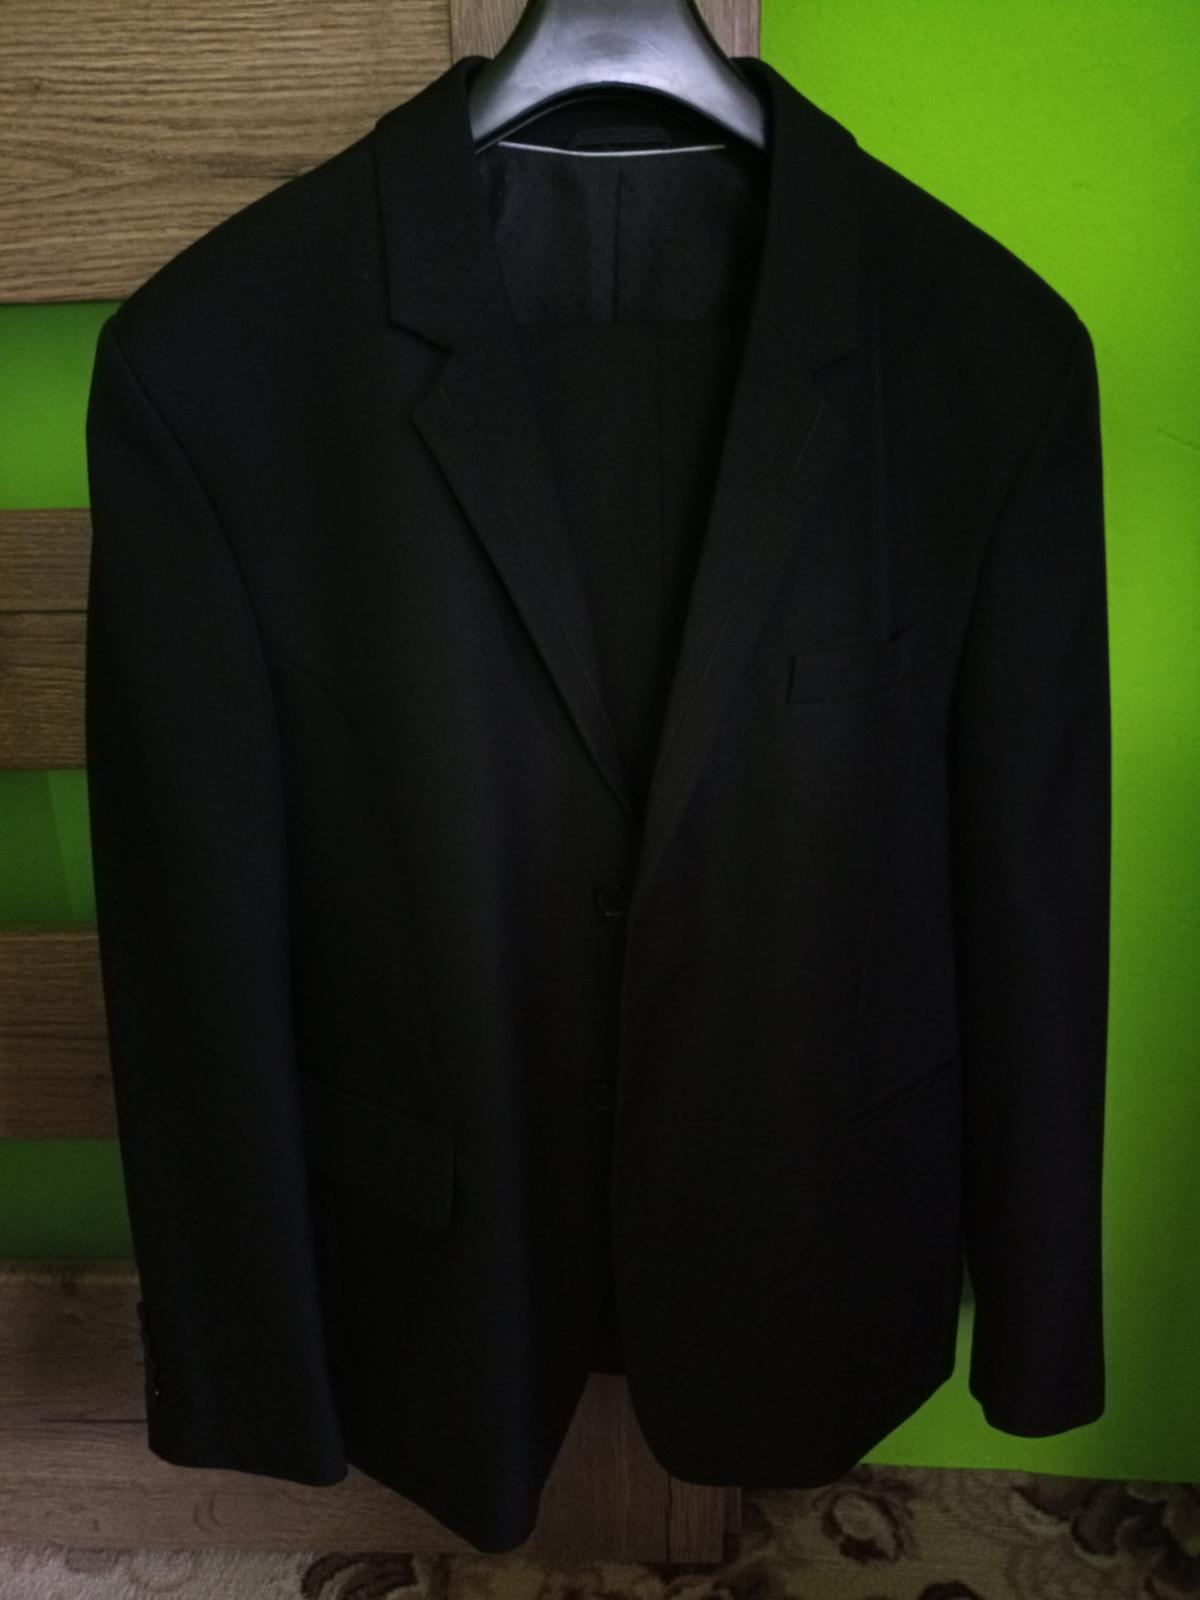 Čierny oblek - Obrázok č. 1